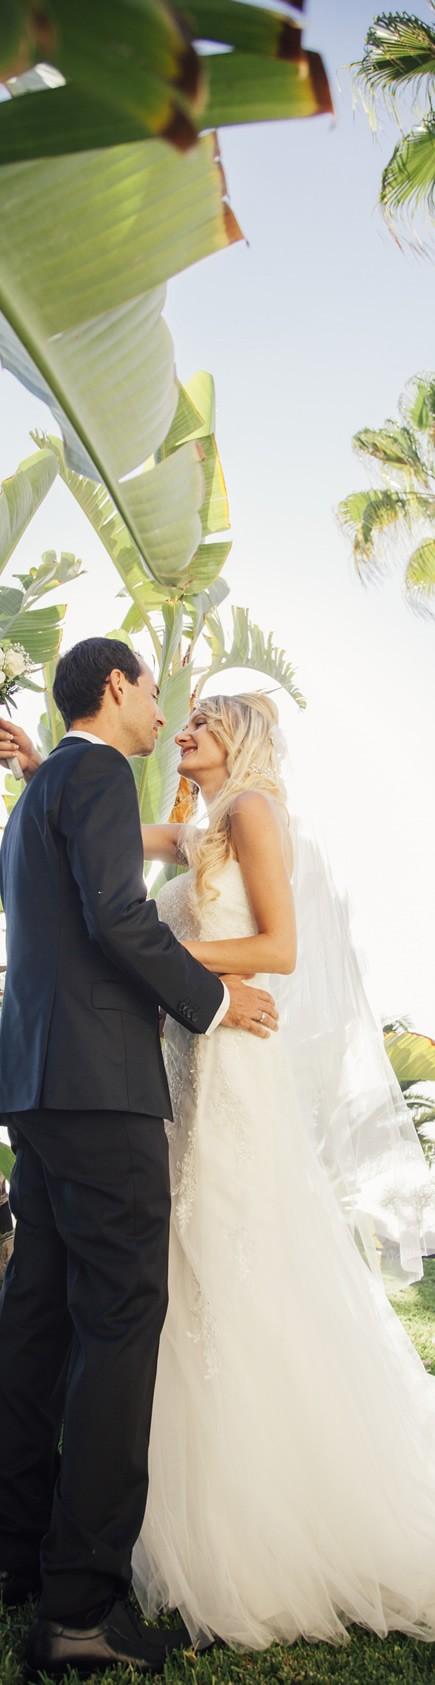 Wedding-Ewa-and-Marek-in-tenerife-myperfectwedding0985